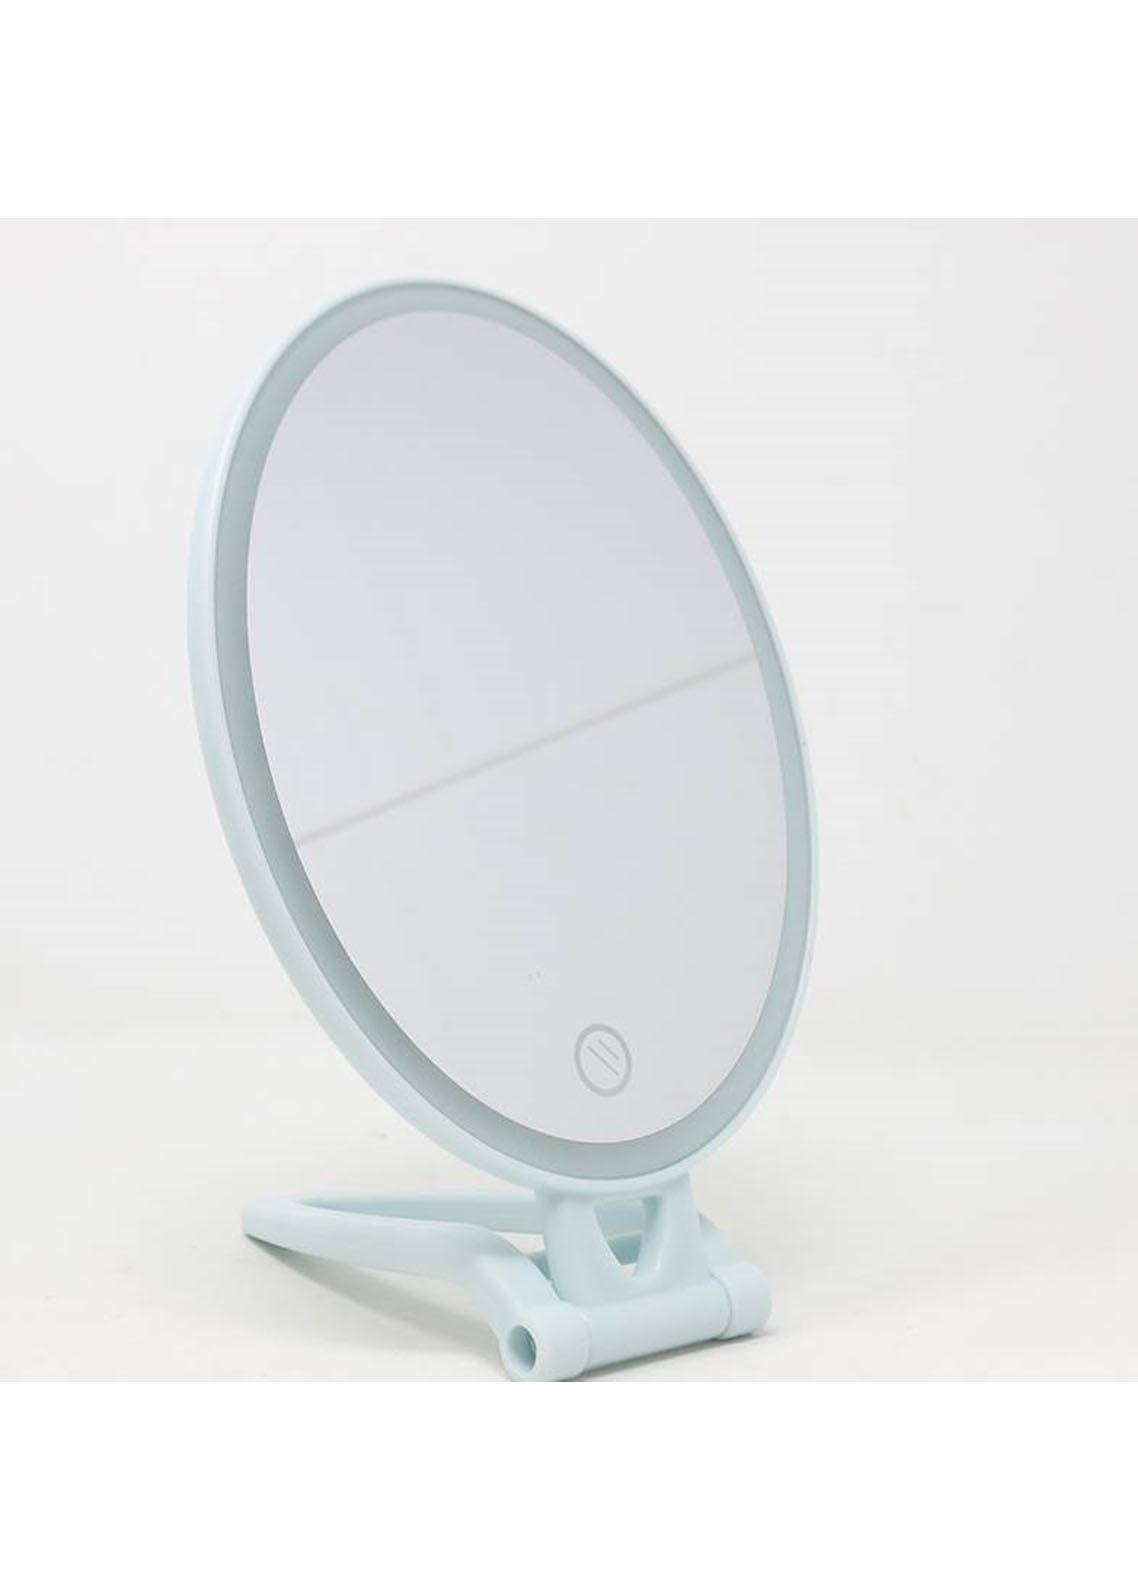 Mumuso Folding Makeup Mirror with LED Light (Blue)